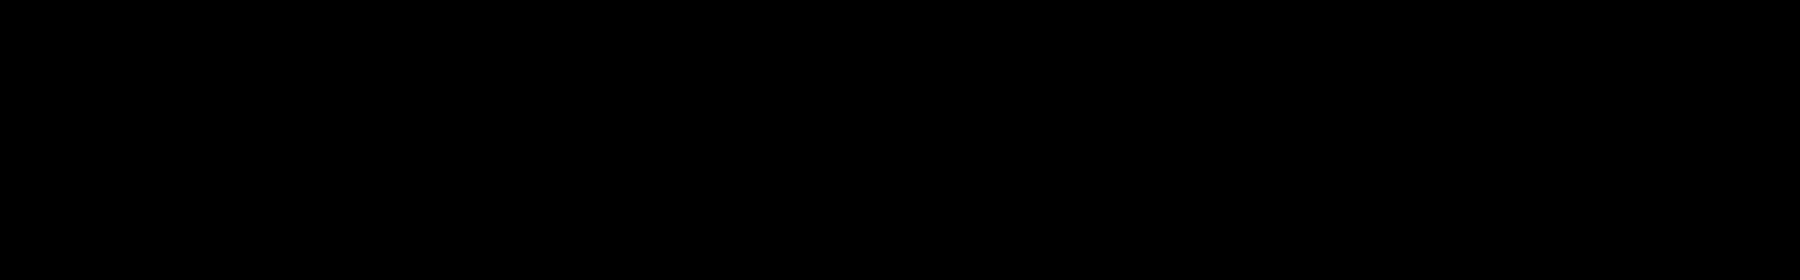 Dj Bustard - LA Summers audio waveform